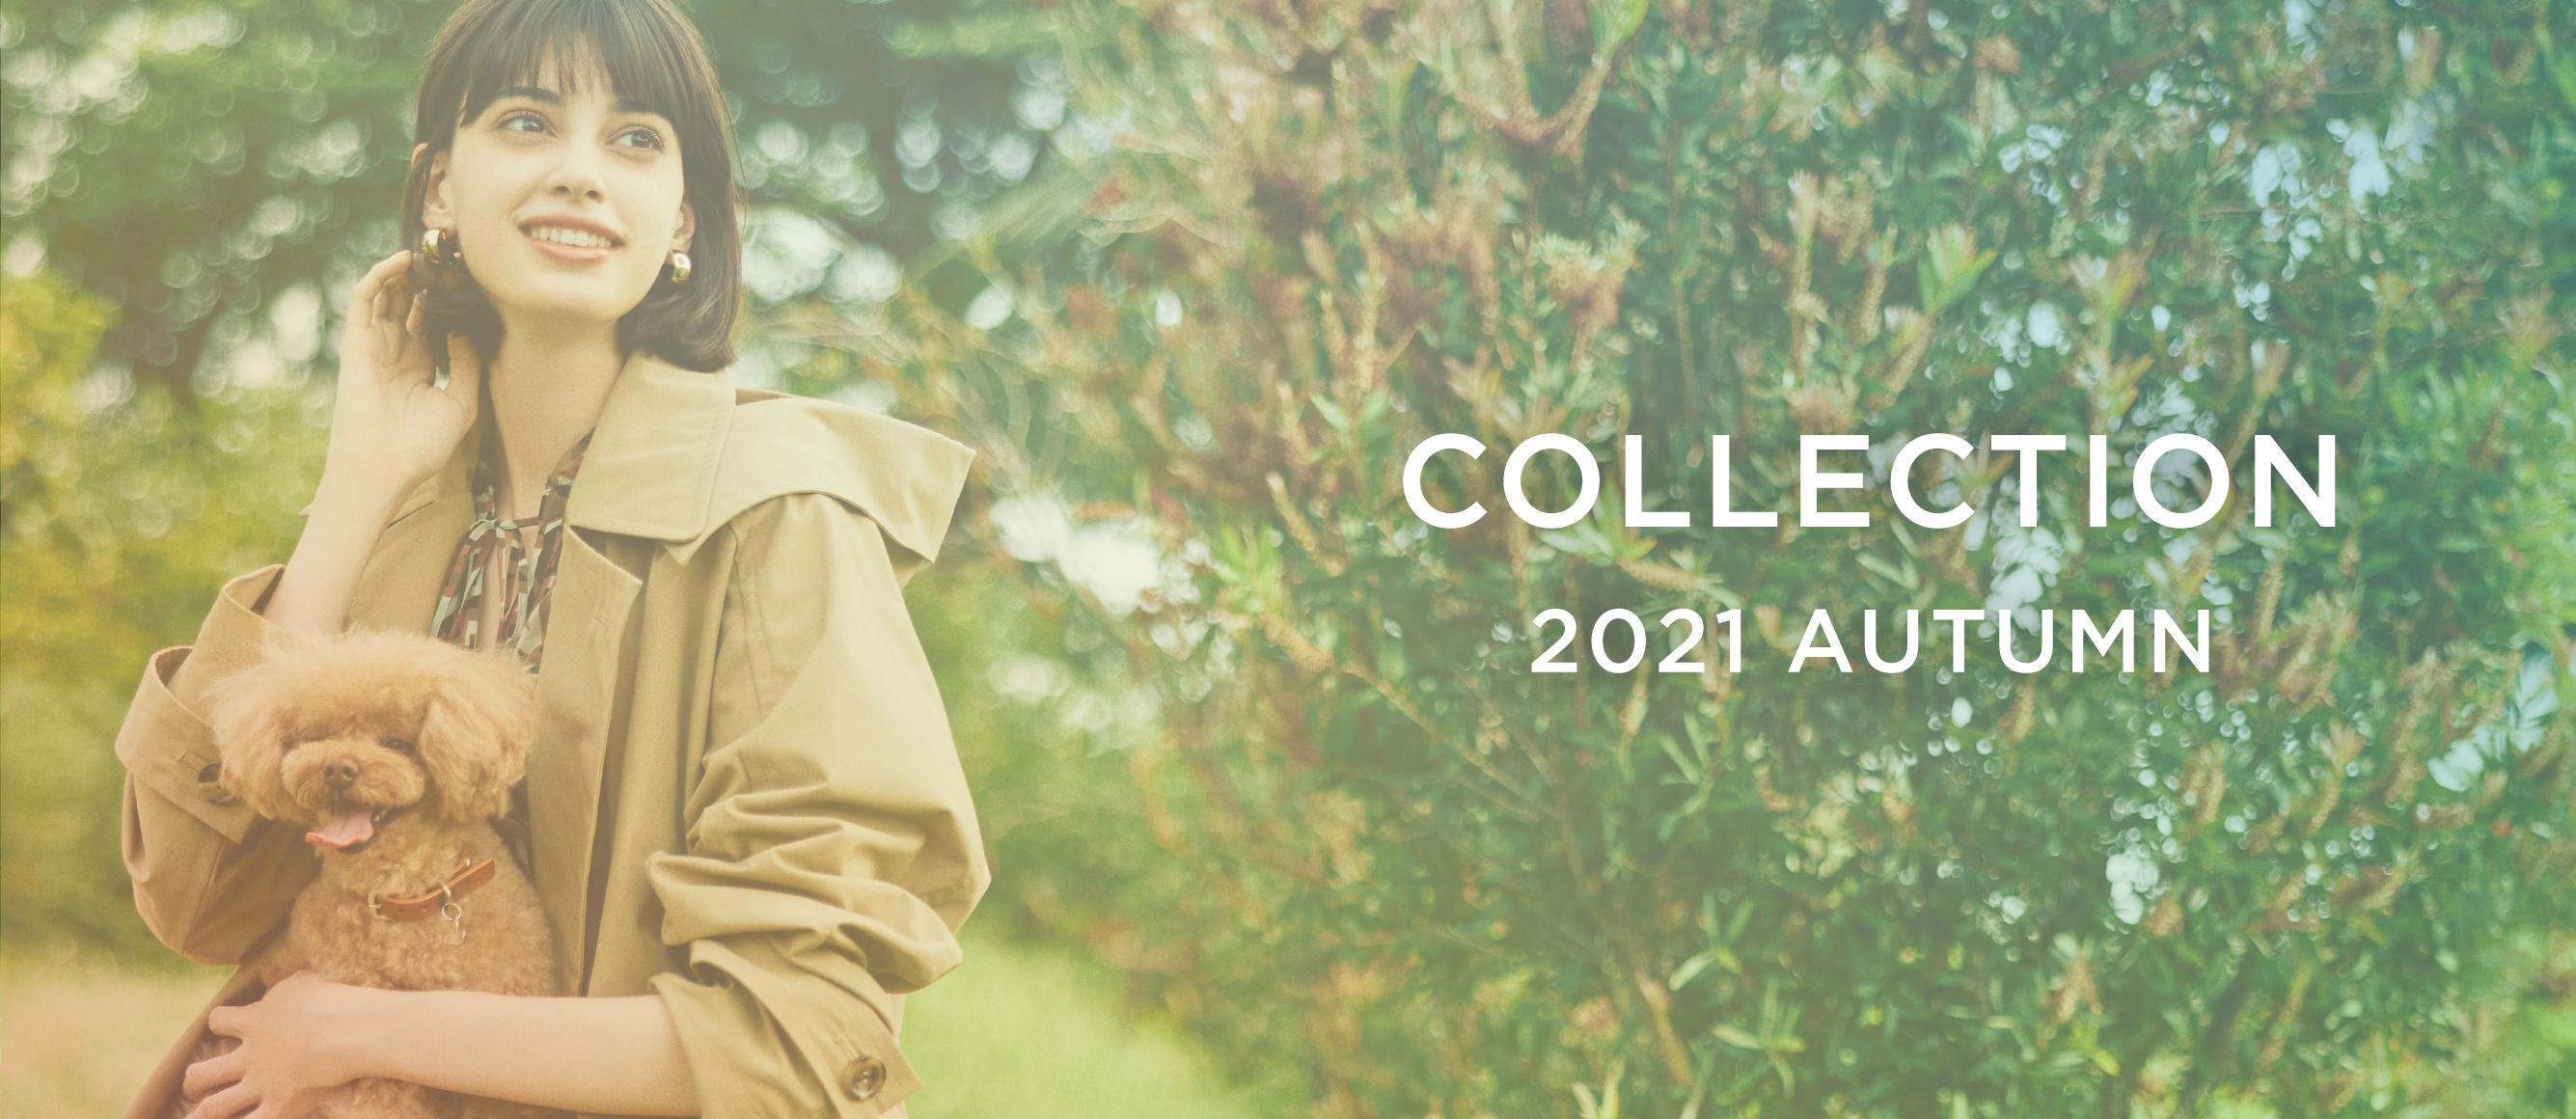 COLLECTION 2021 AUTUMN